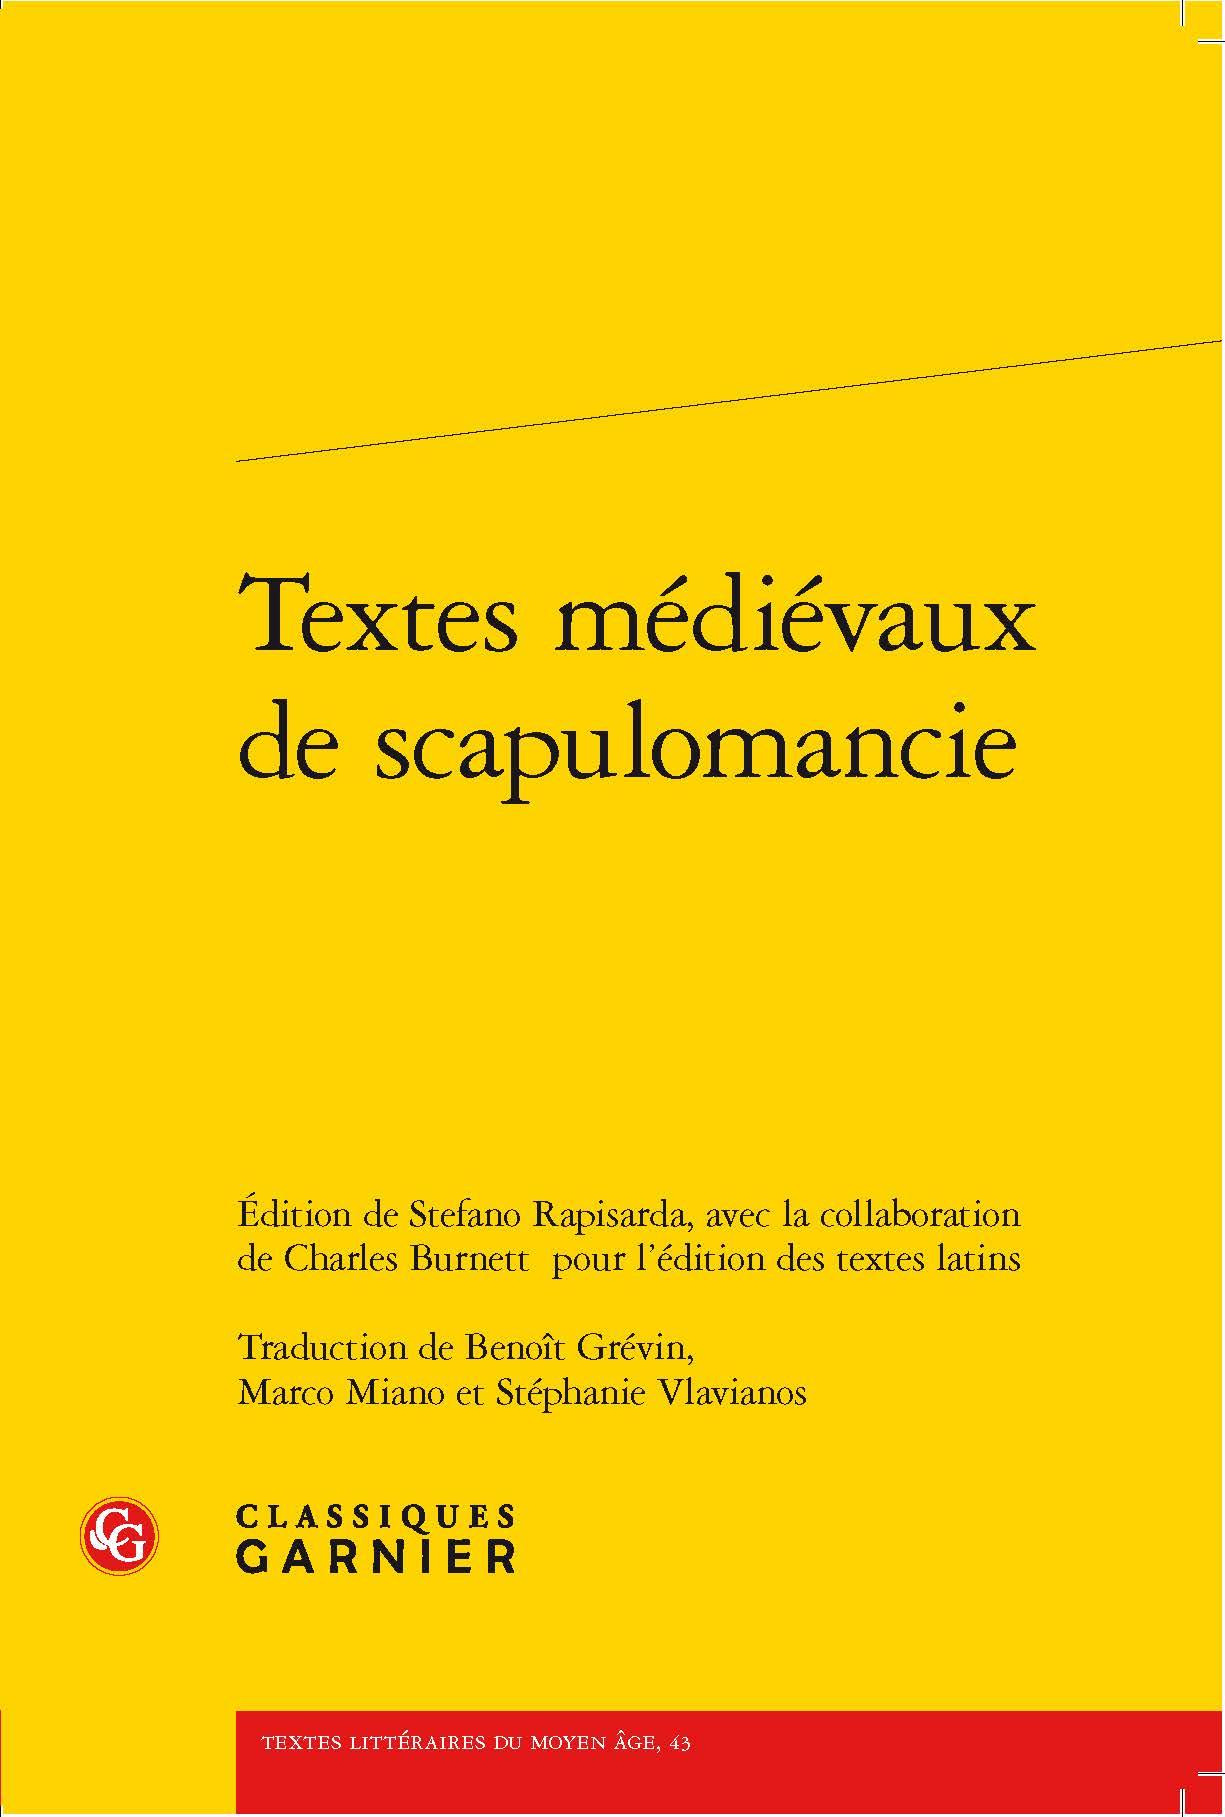 Stefano Rapisarda in collaboration with Charles Burnett (eds.): Textes  médiévaux de scapulomancie